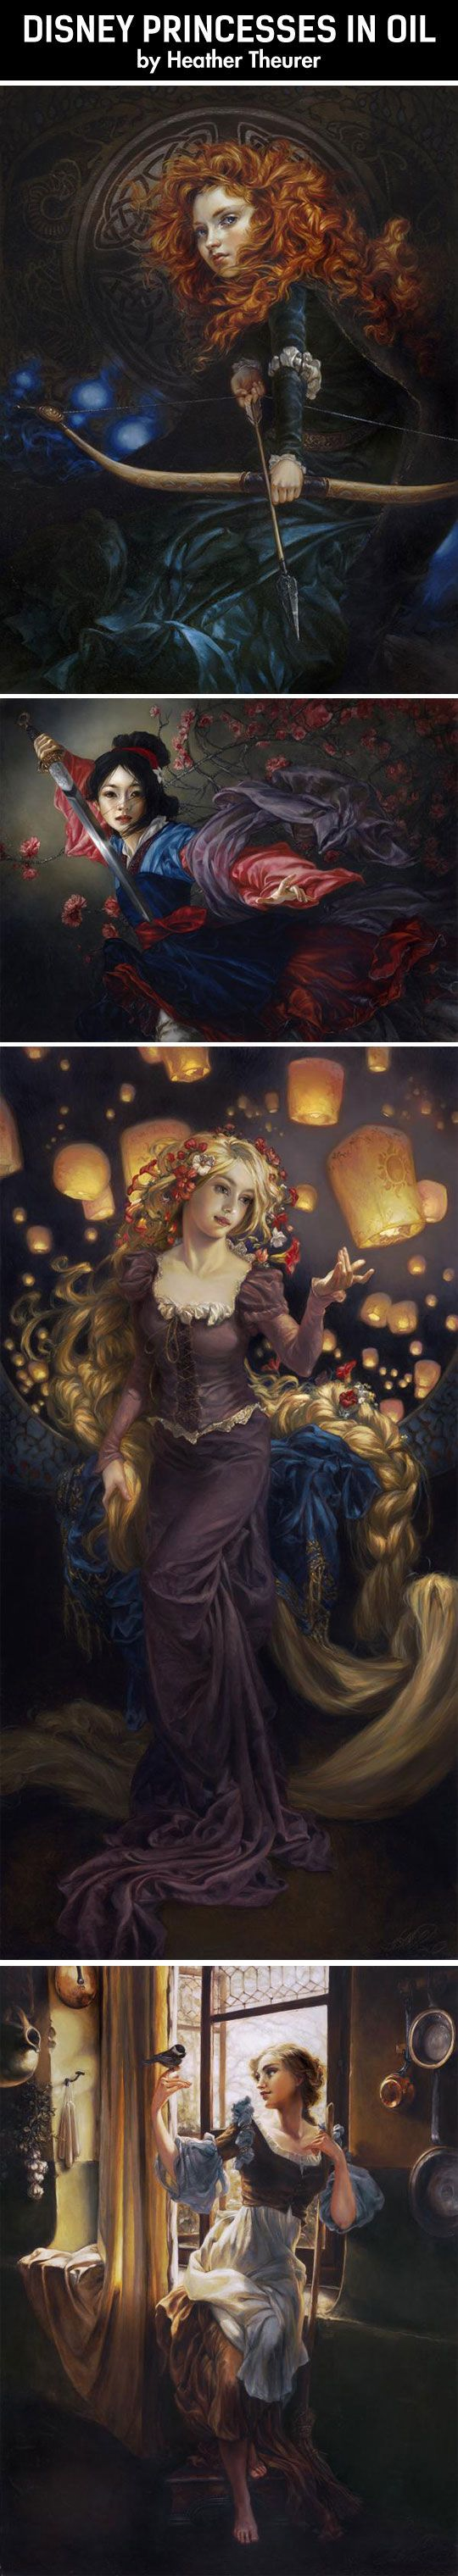 Disney princesses in oil…^this is amazing!: